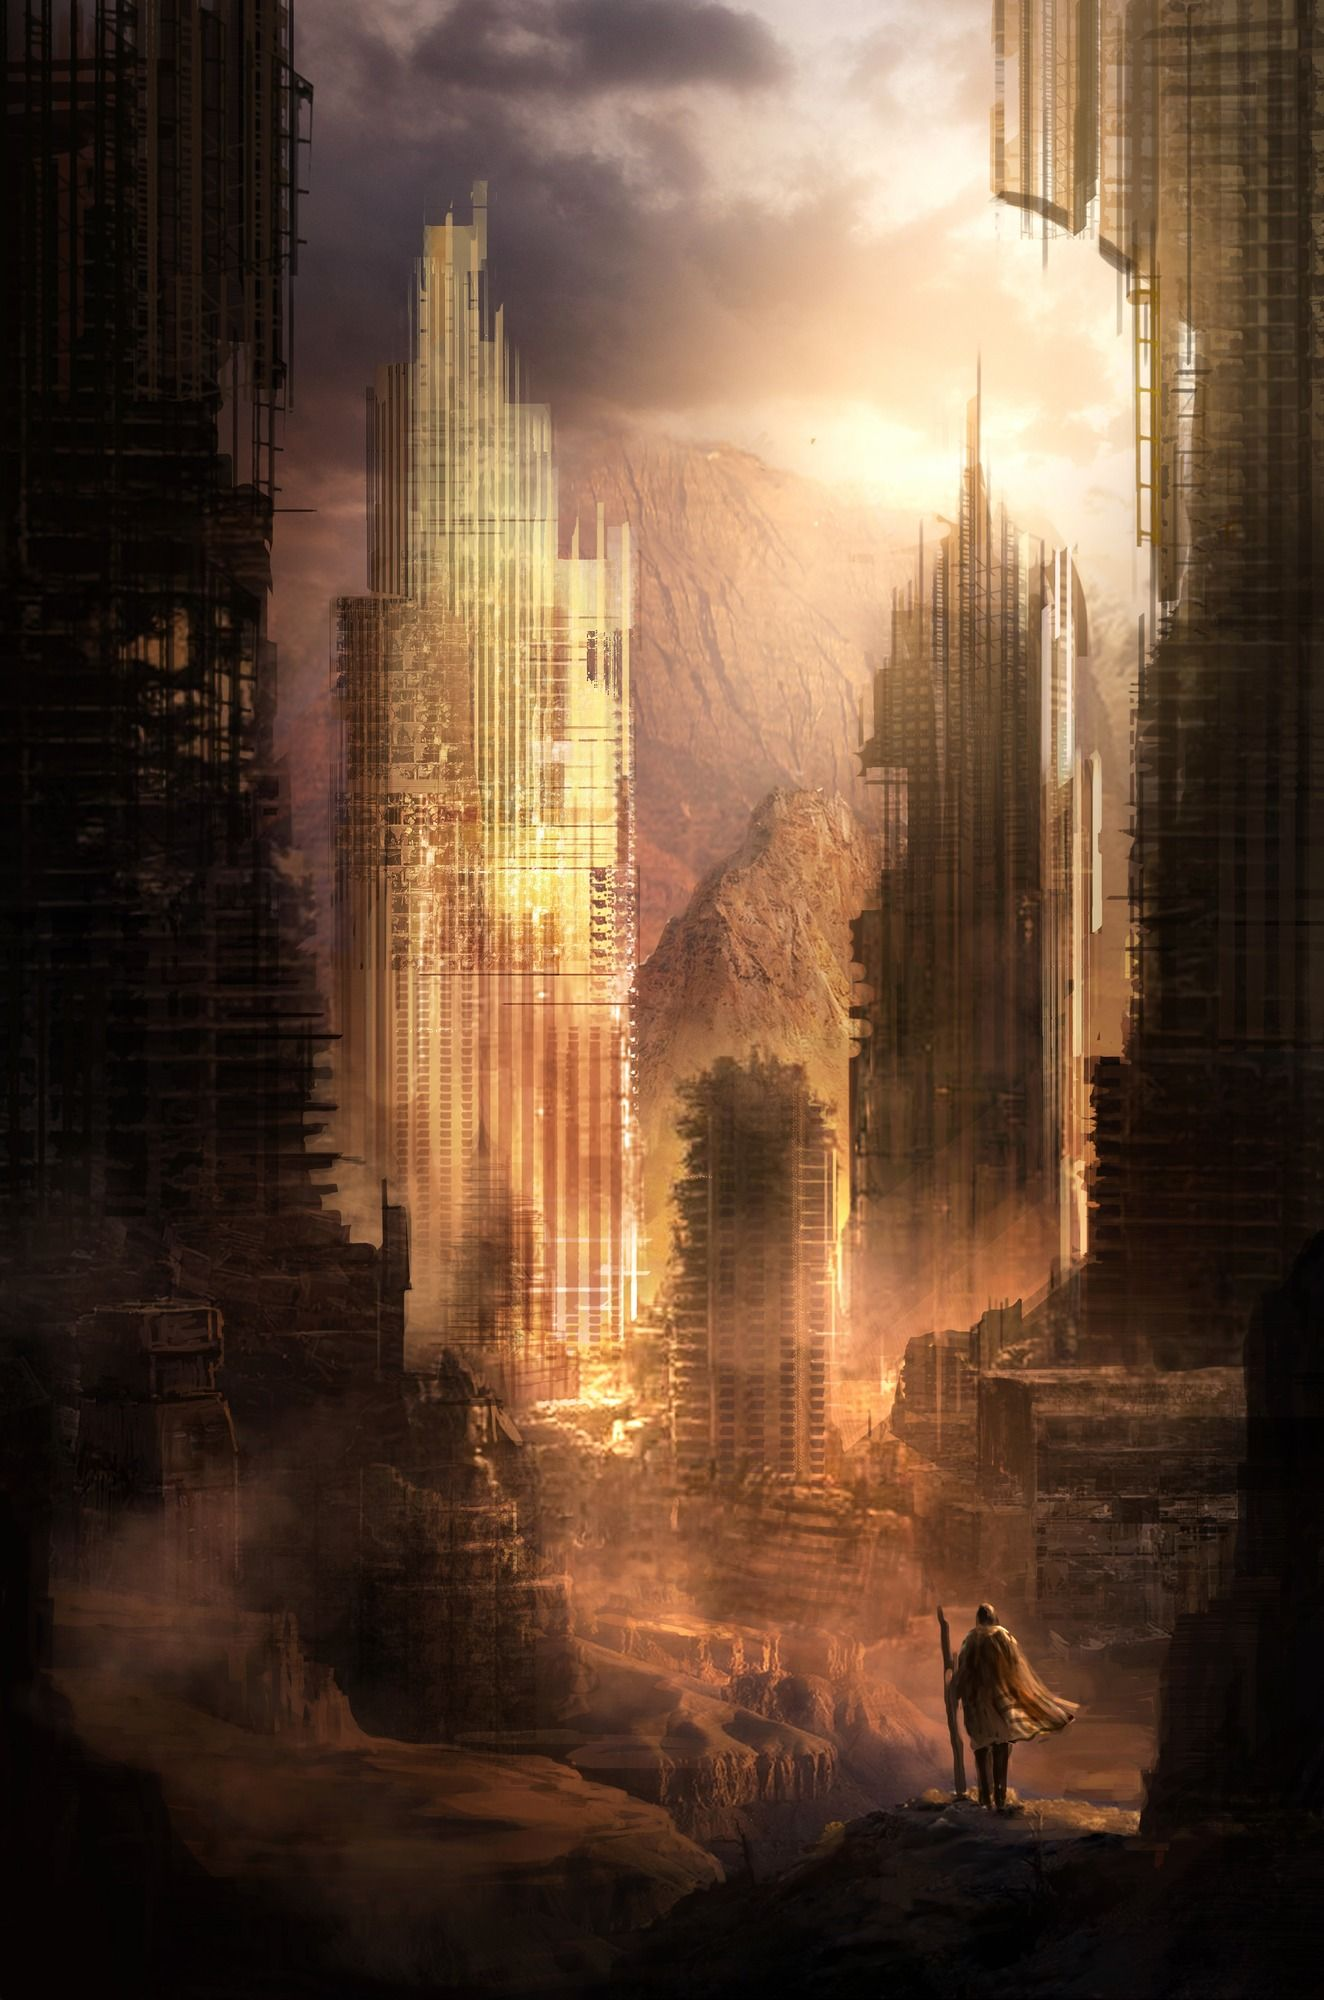 fantasy and sci-fi art | Tumblr